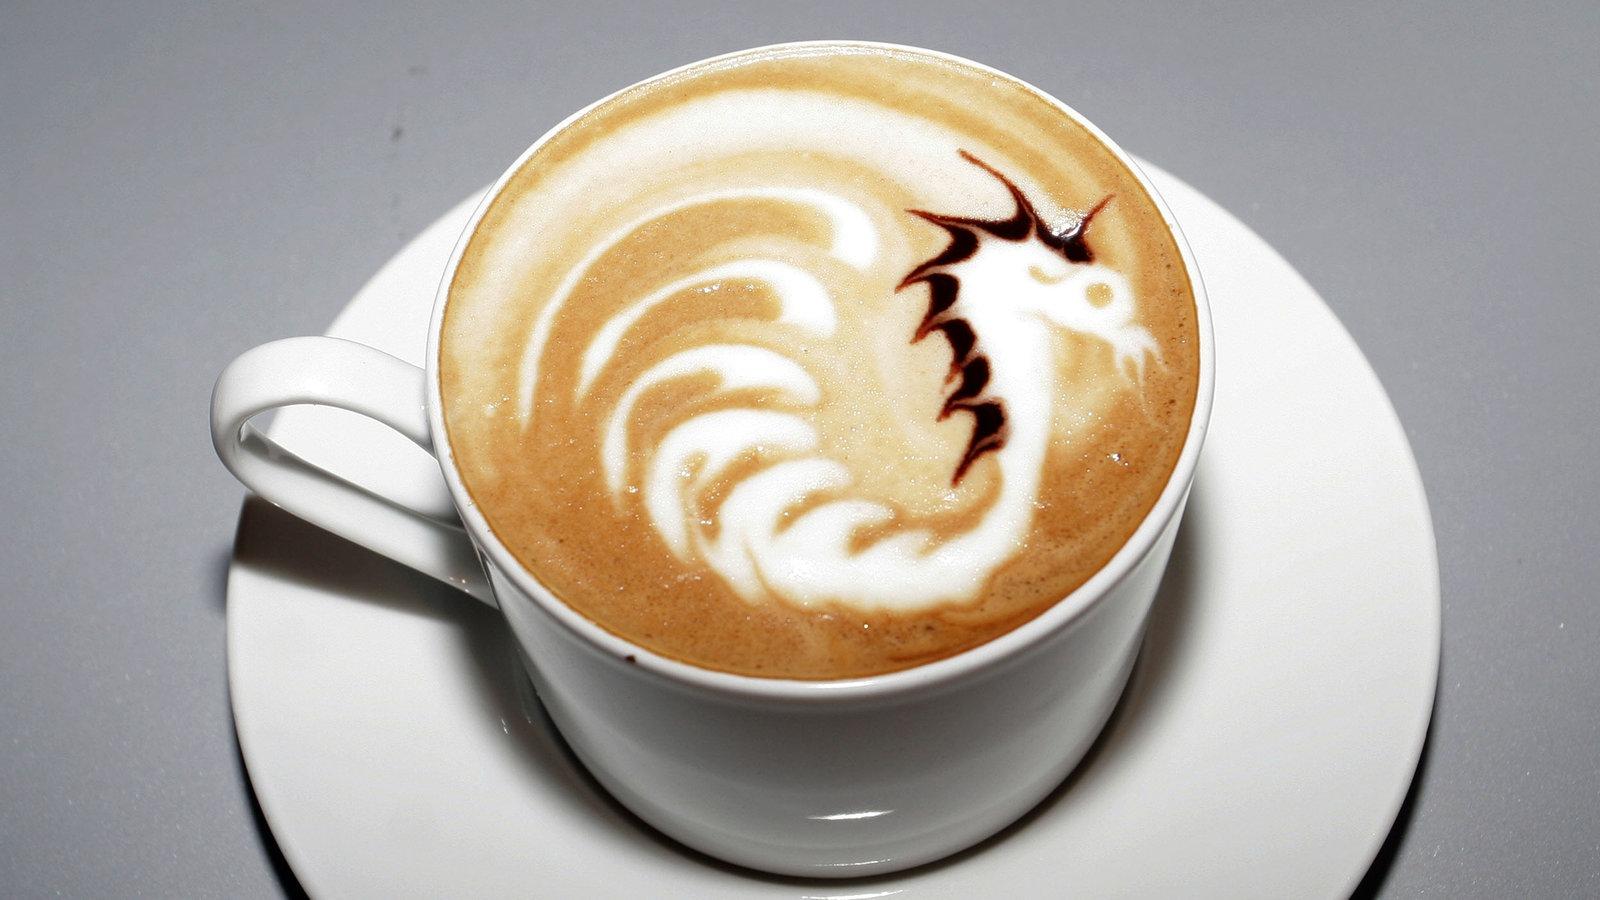 Starbucks >> Kaffee: Der Kult um den Kaffee - Trinken - Gesellschaft - Planet Wissen